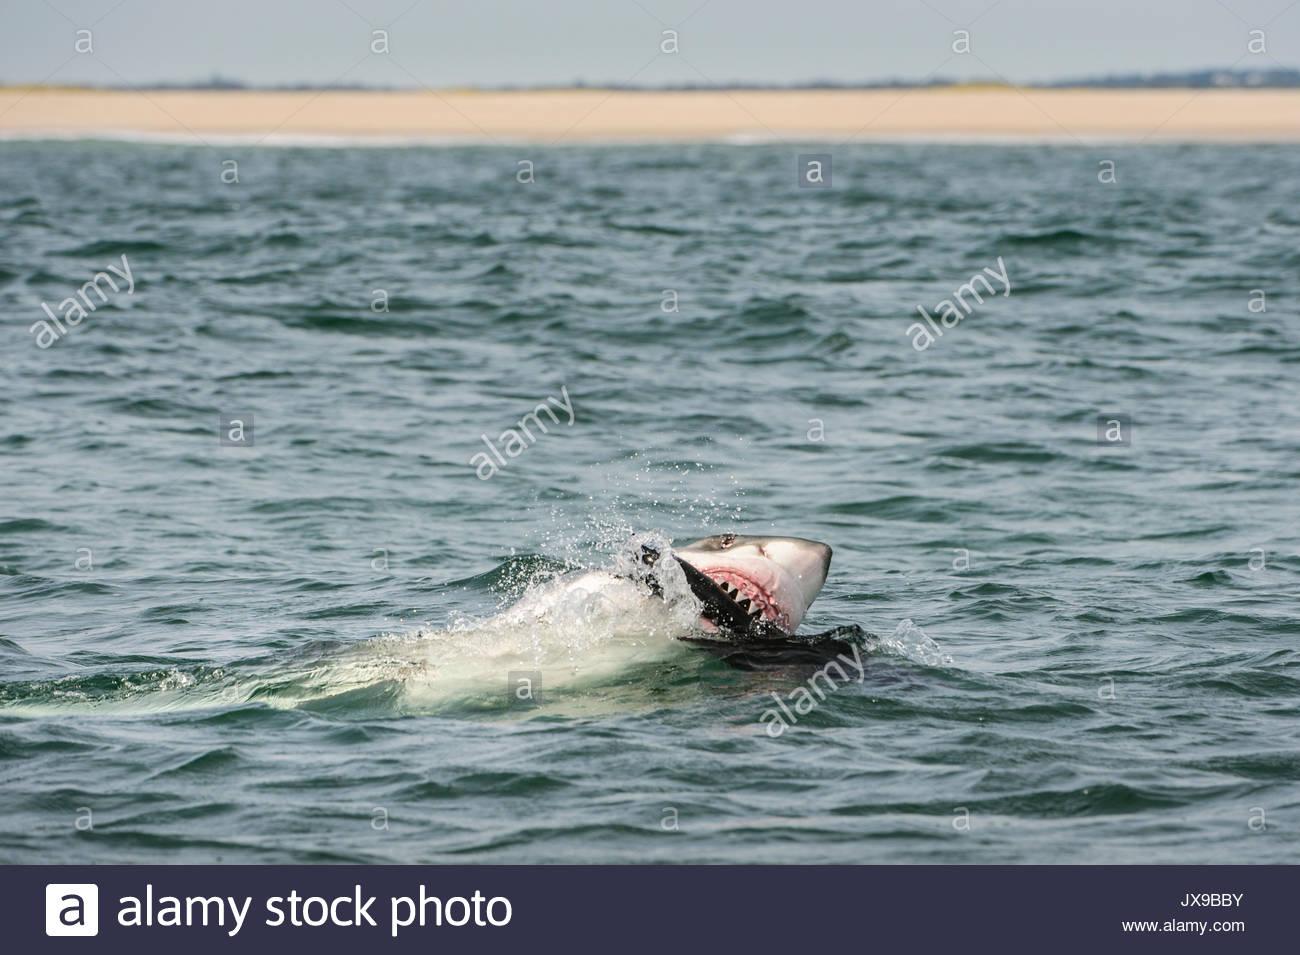 a-great-white-shark-bites-a-seal-decoy-o